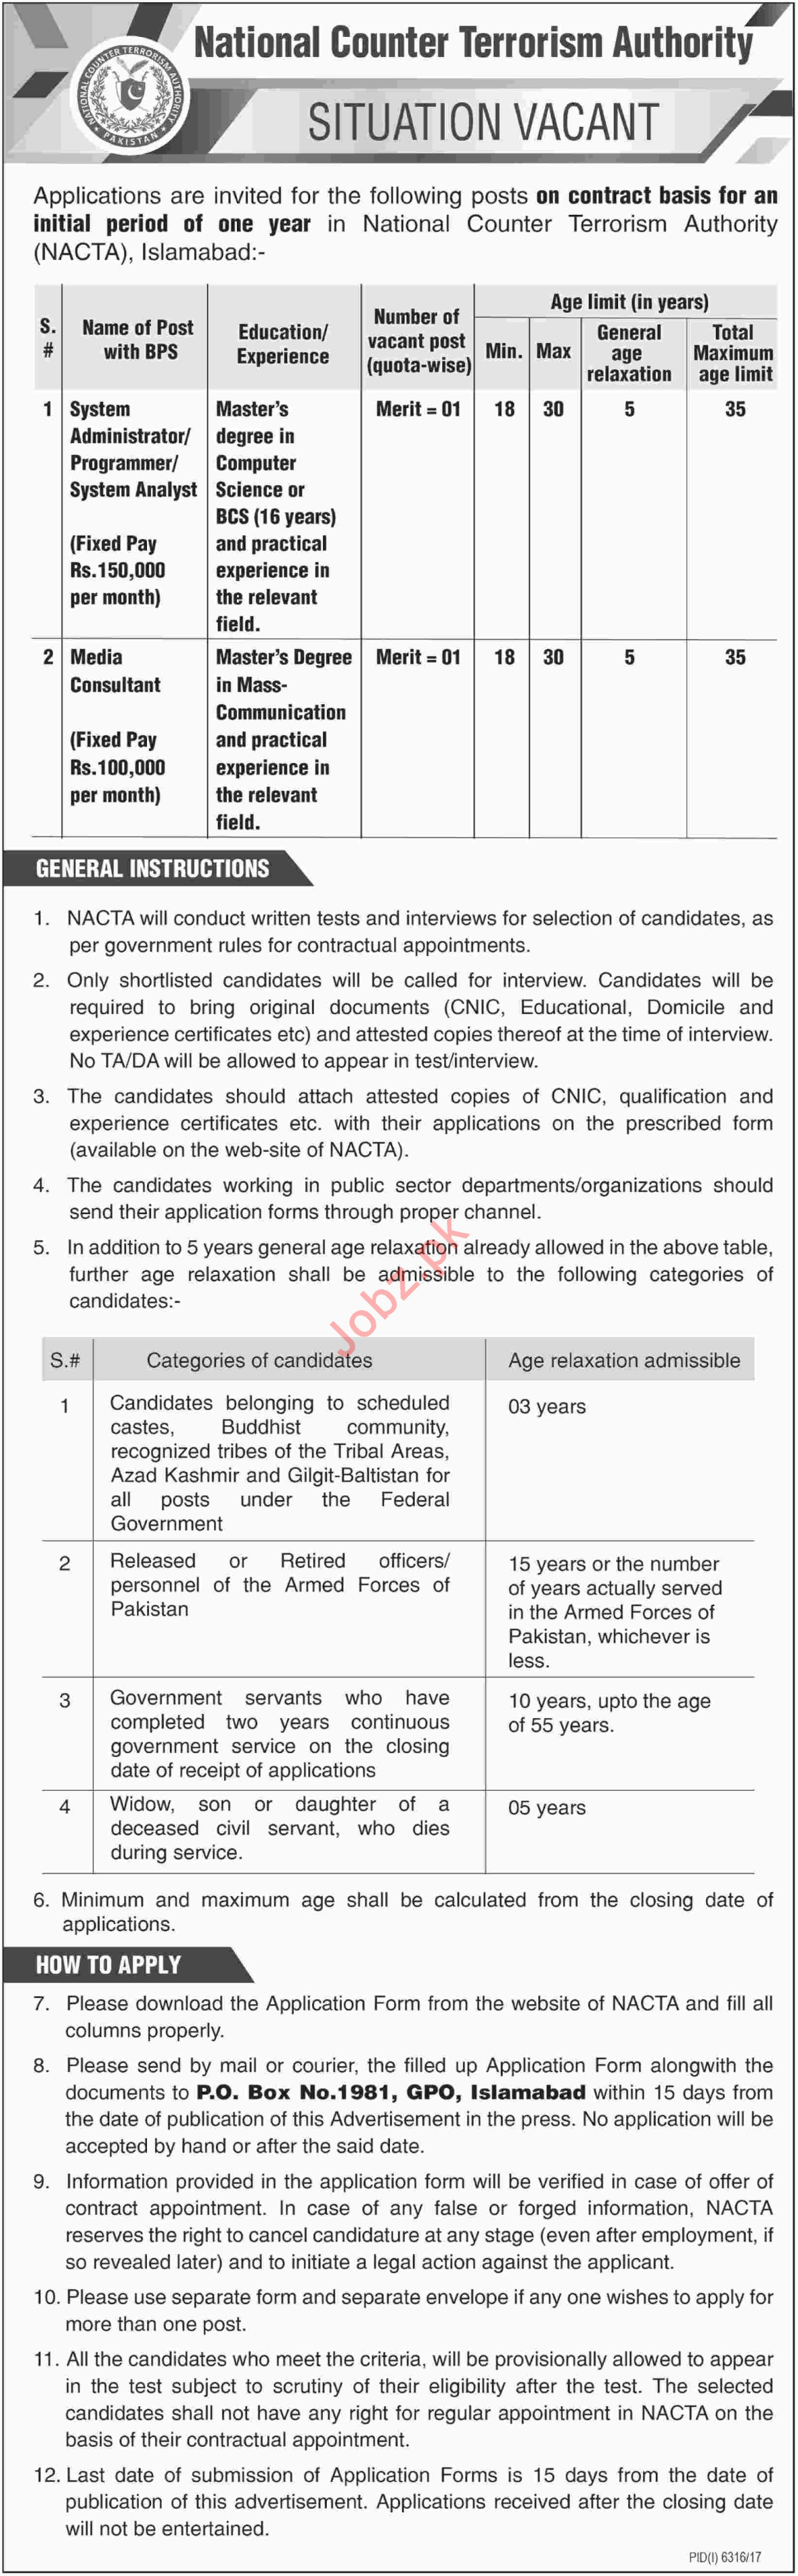 National Counter Terrorism Authority NACTA Islamabad Jobs